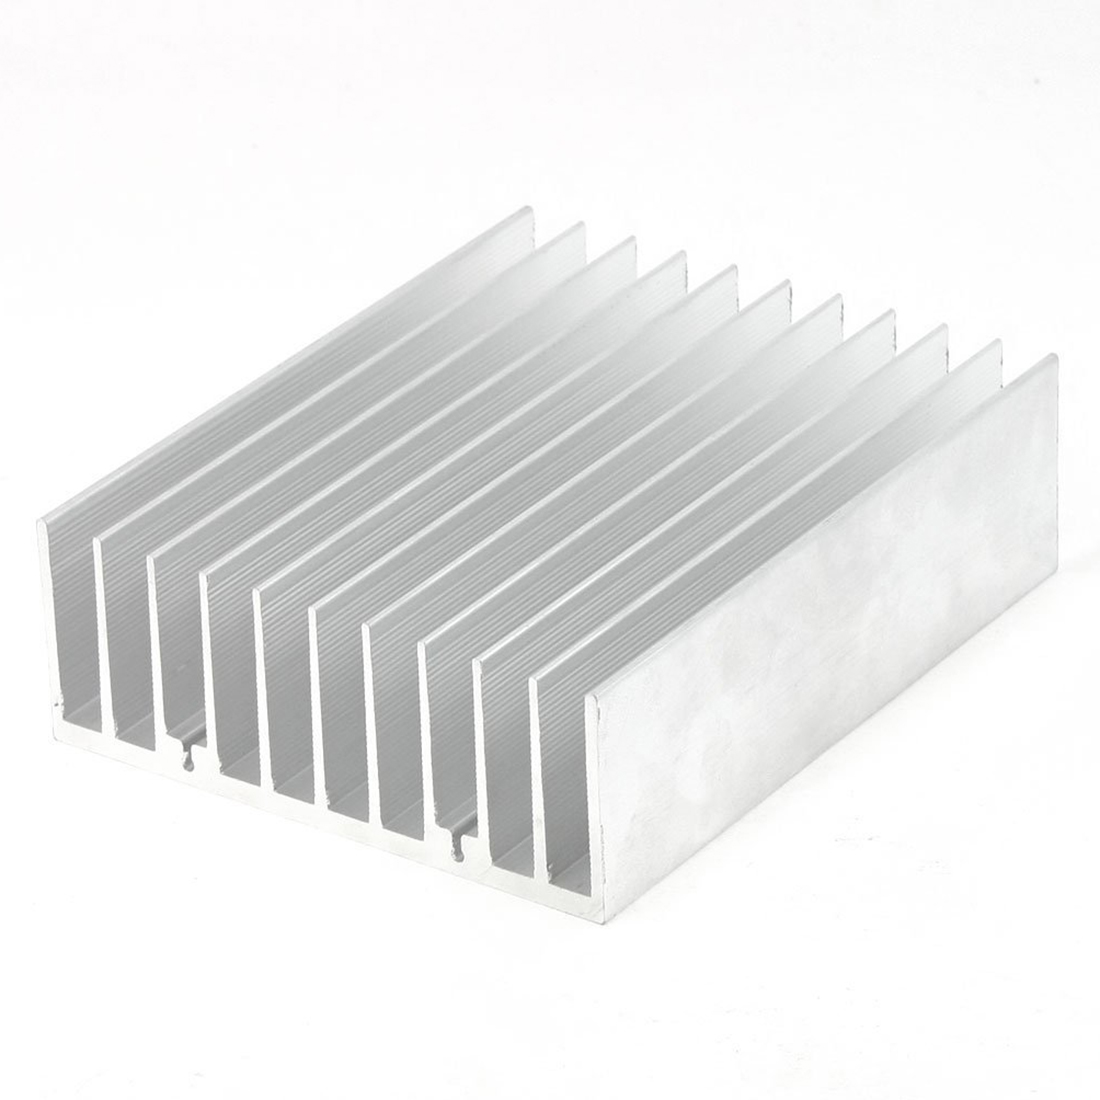 120mm x 45mm x 150mm Heatsink Heat Dissipation Aluminium Cooling Fin 5pcs 45x10x60mm aluminium heatsink heat diffuse cooling cooler fin